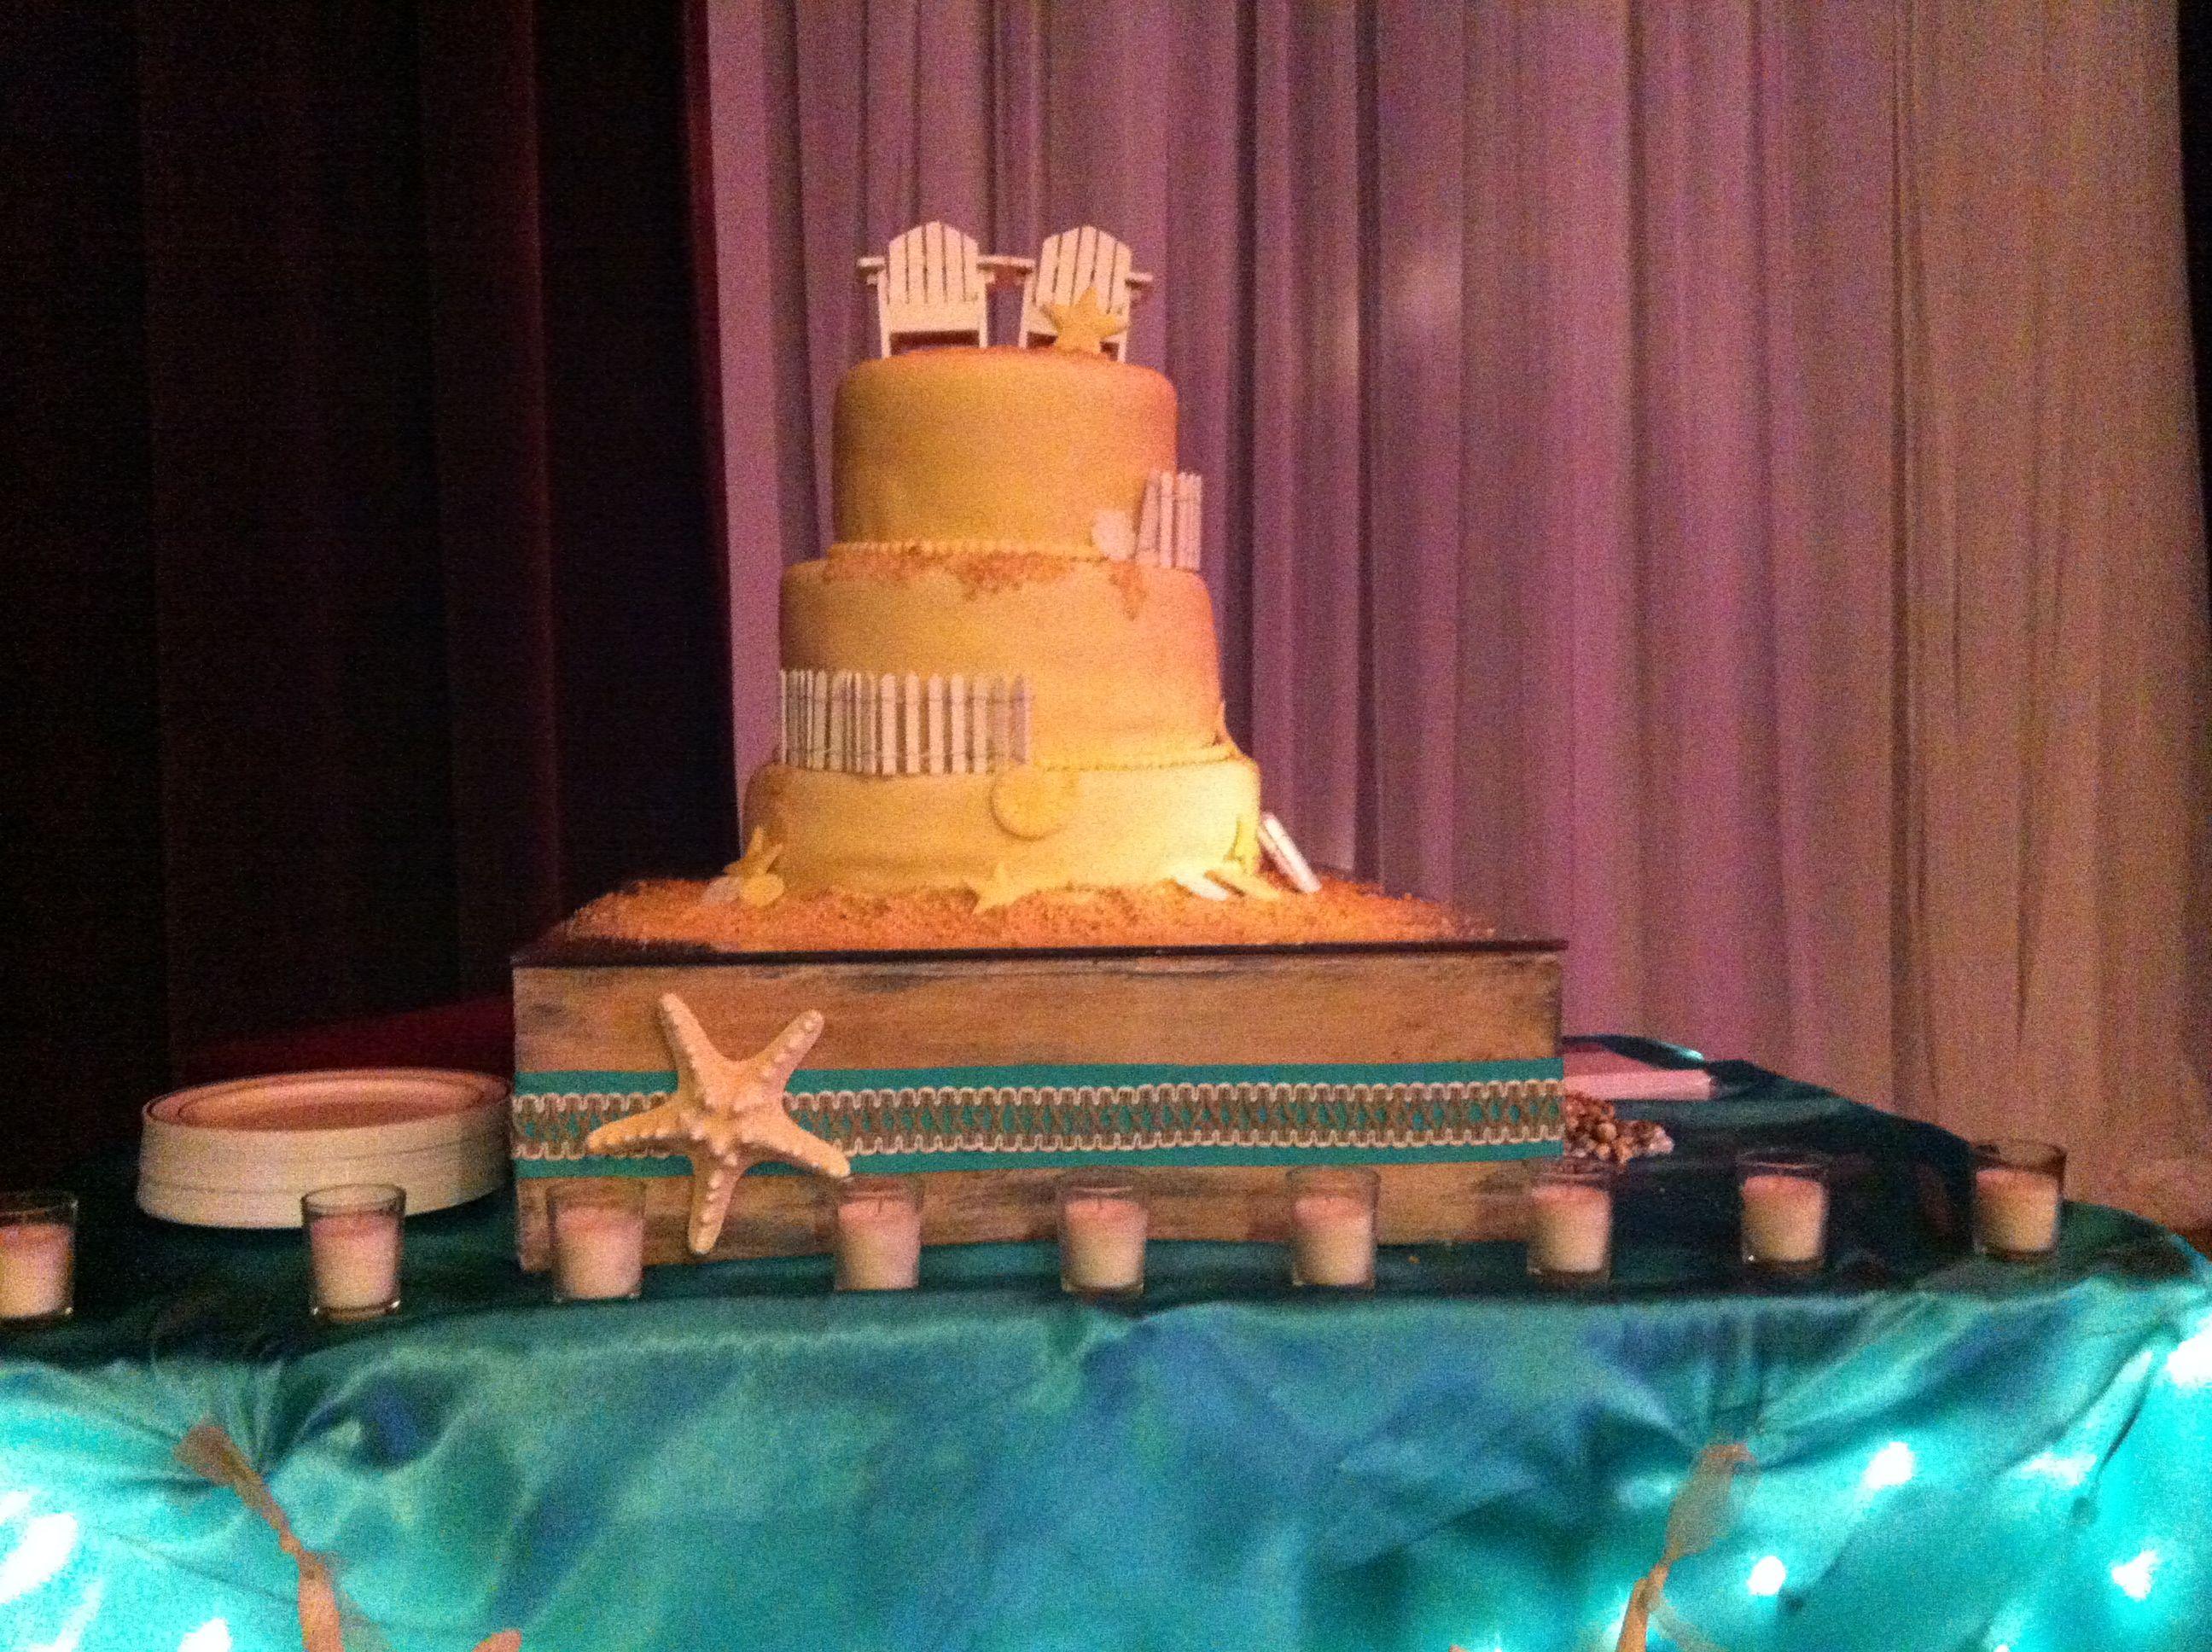 Amanda's wedding cake.